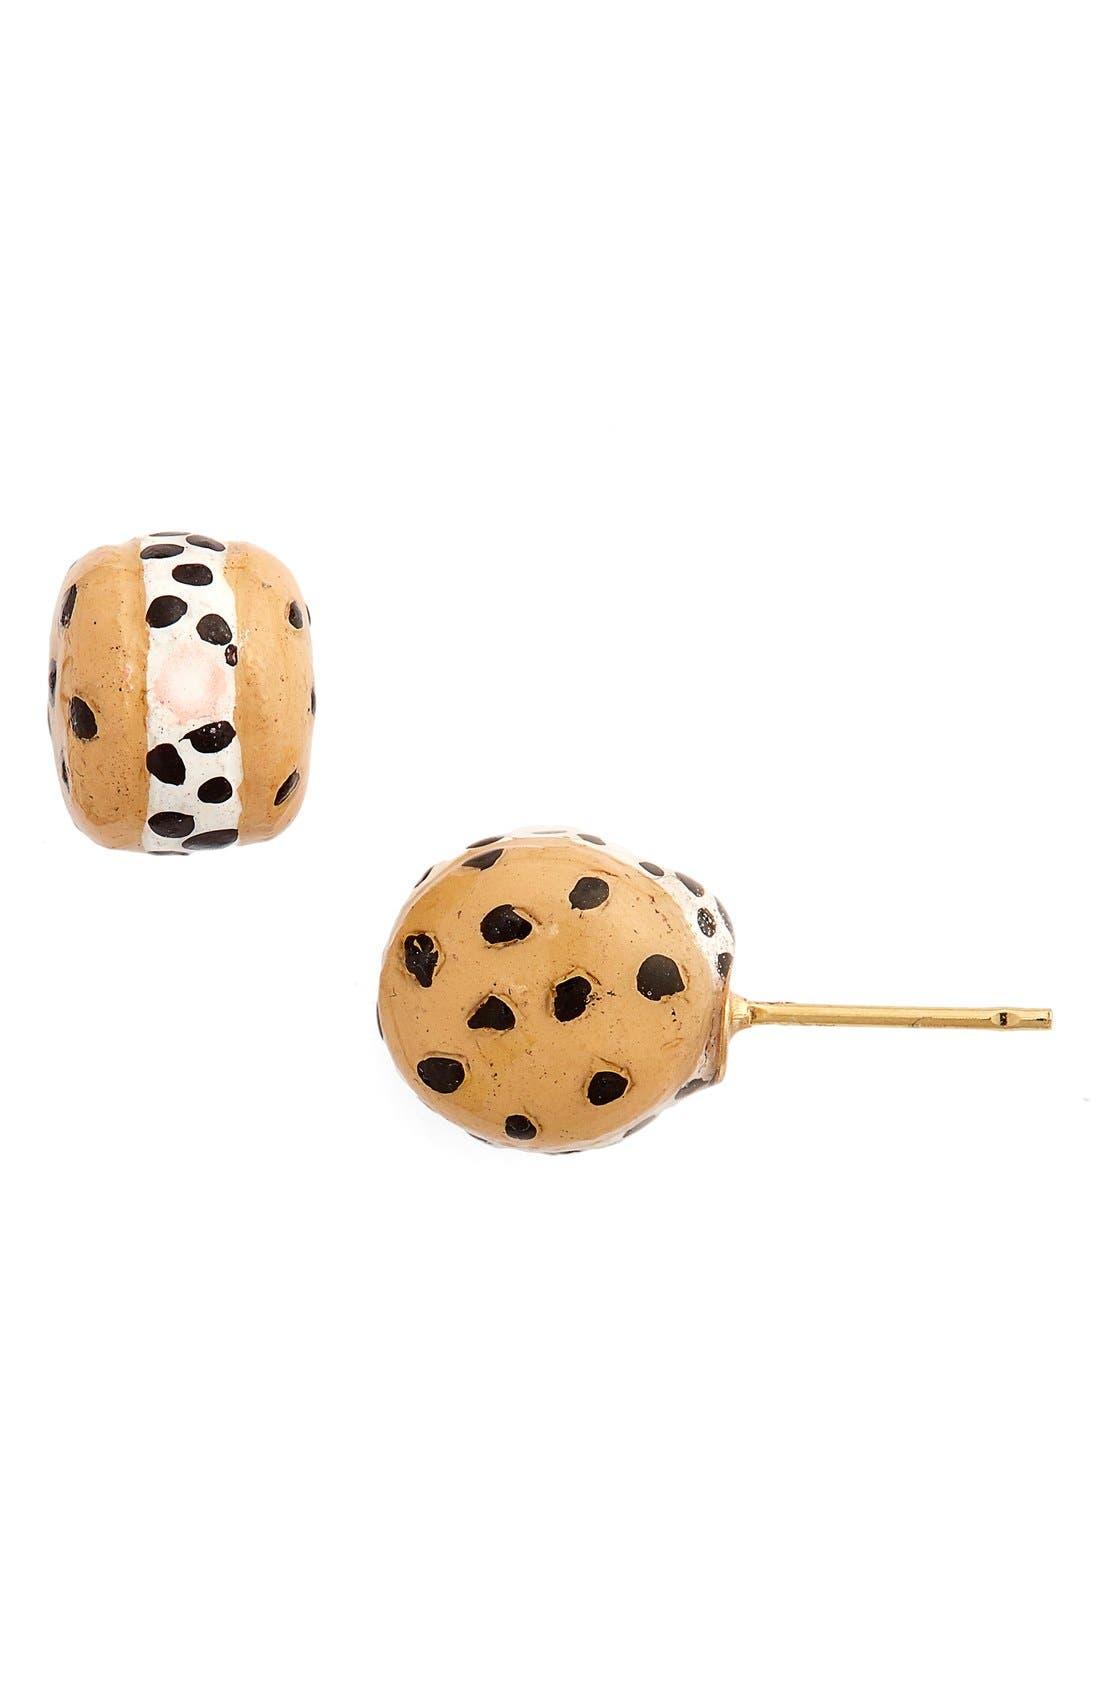 Alternate Image 1 Selected - Venessa Arizaga 'Cookie Monsta' Stud Earrings